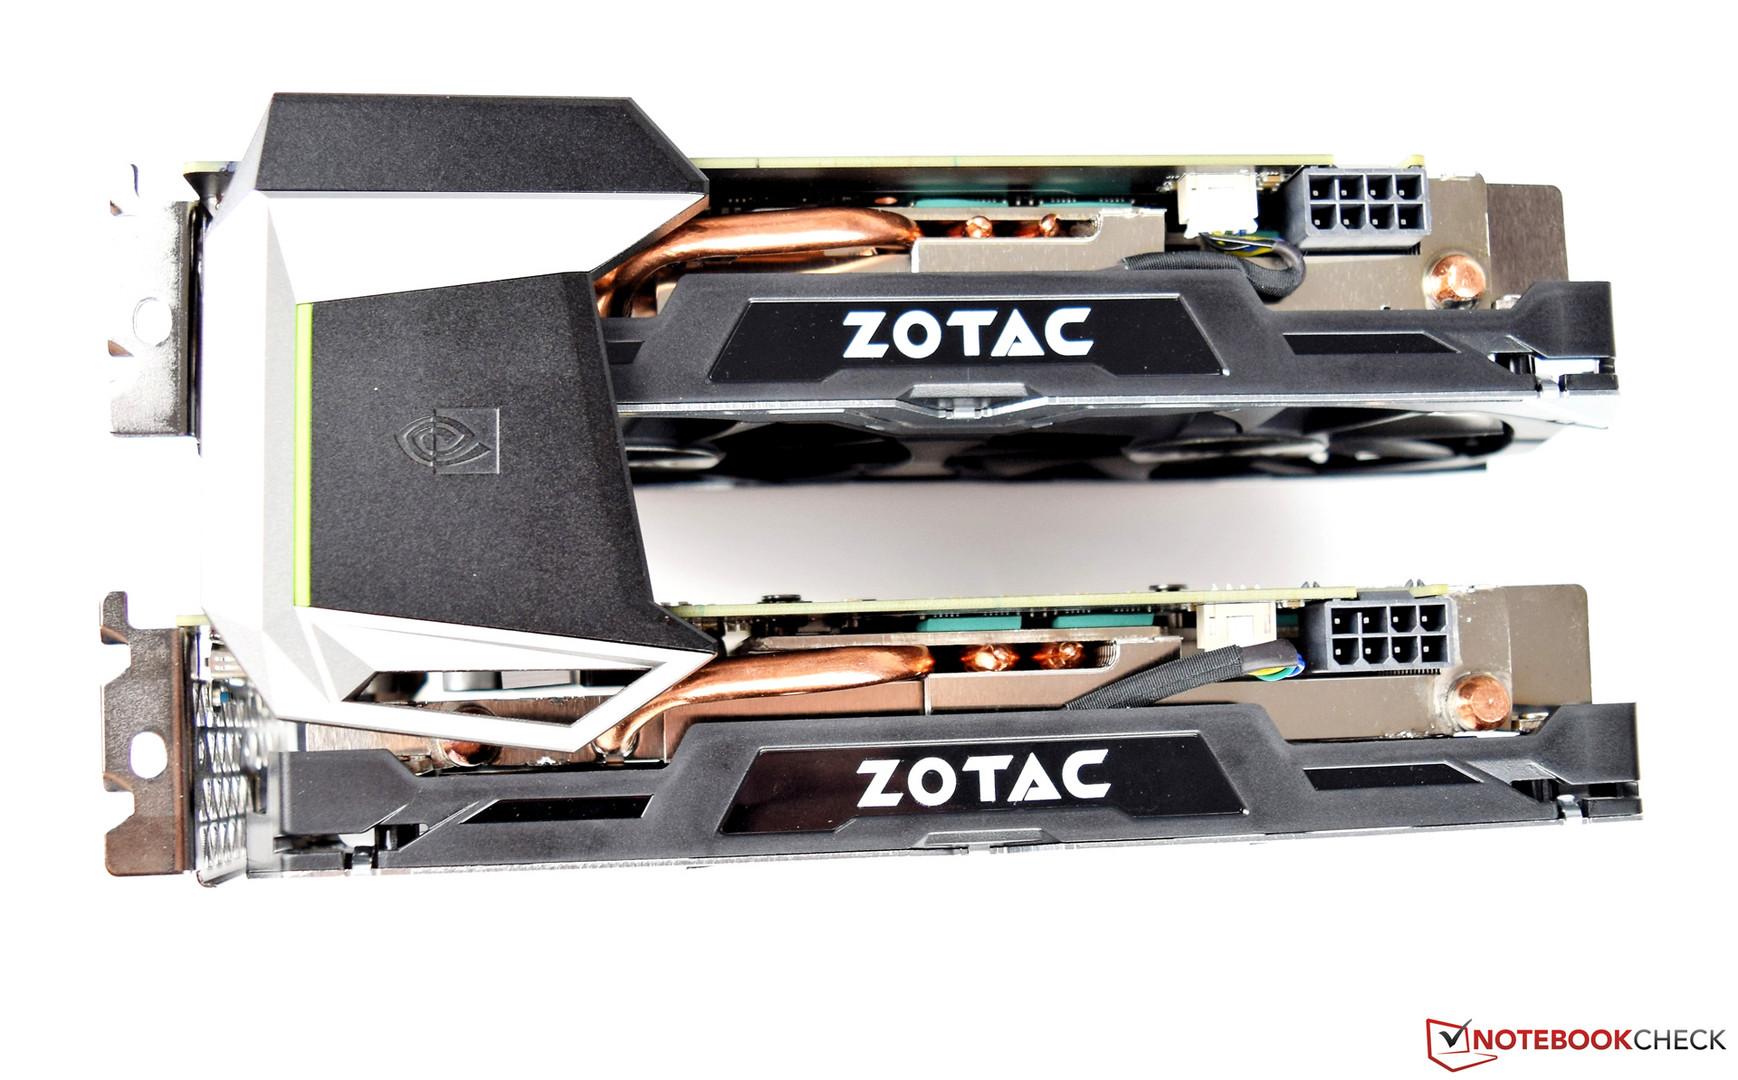 Zotac GeForce GTX 1070 Mini (SLI configuration)